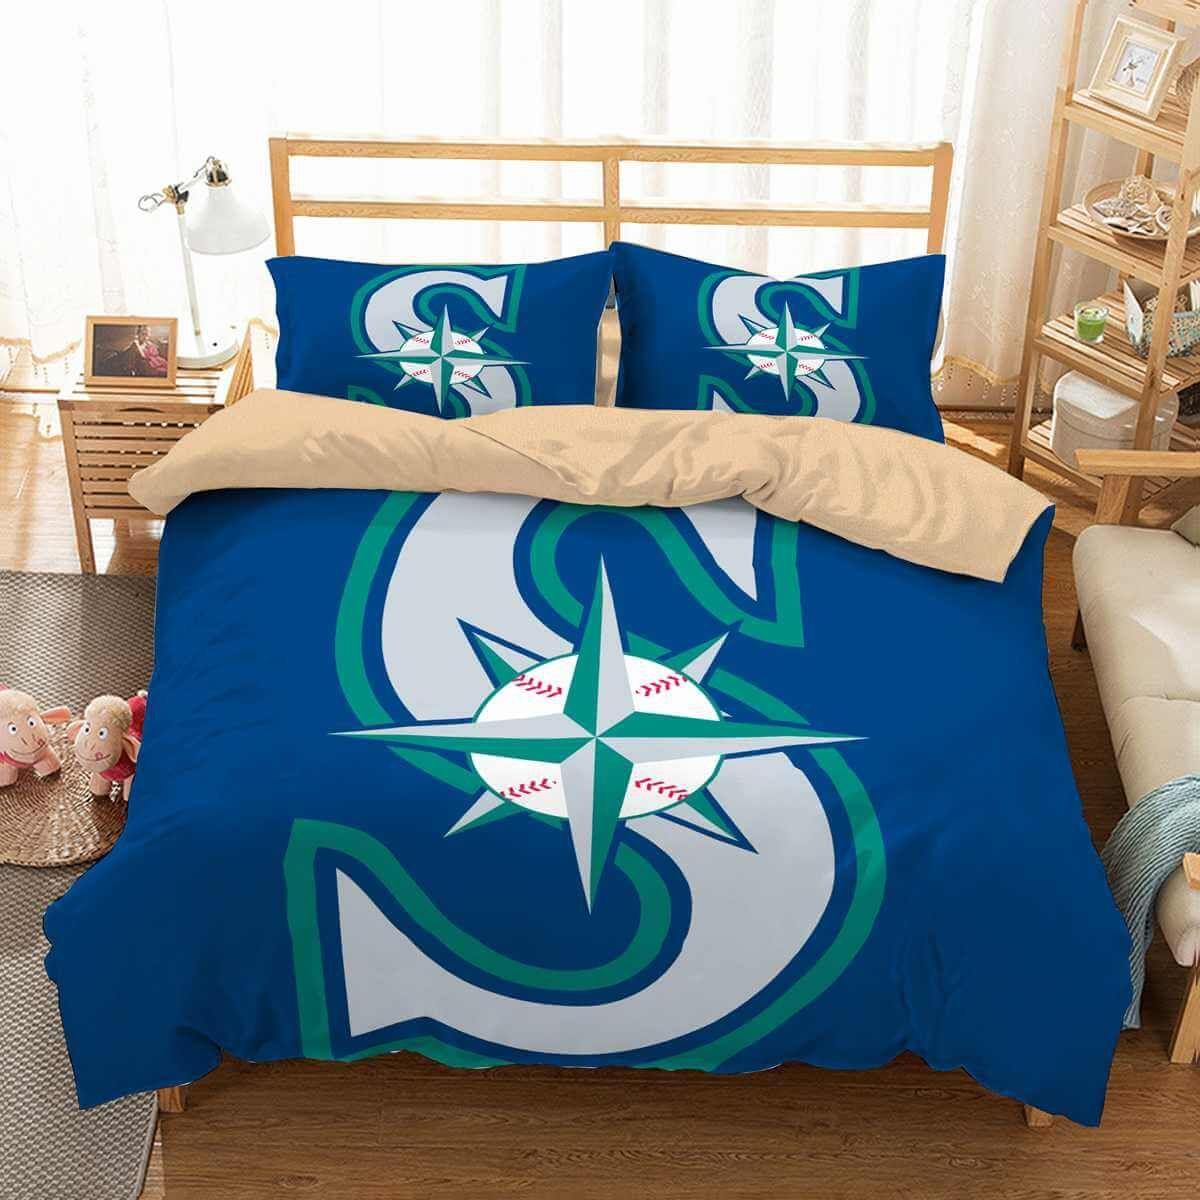 3d Customize Seattle Mariners Bedding Set Duvet Cover Set Bedroom Set Bedlinen In 2020 Duvet Bedding Sets Bed Bed Linen Australia